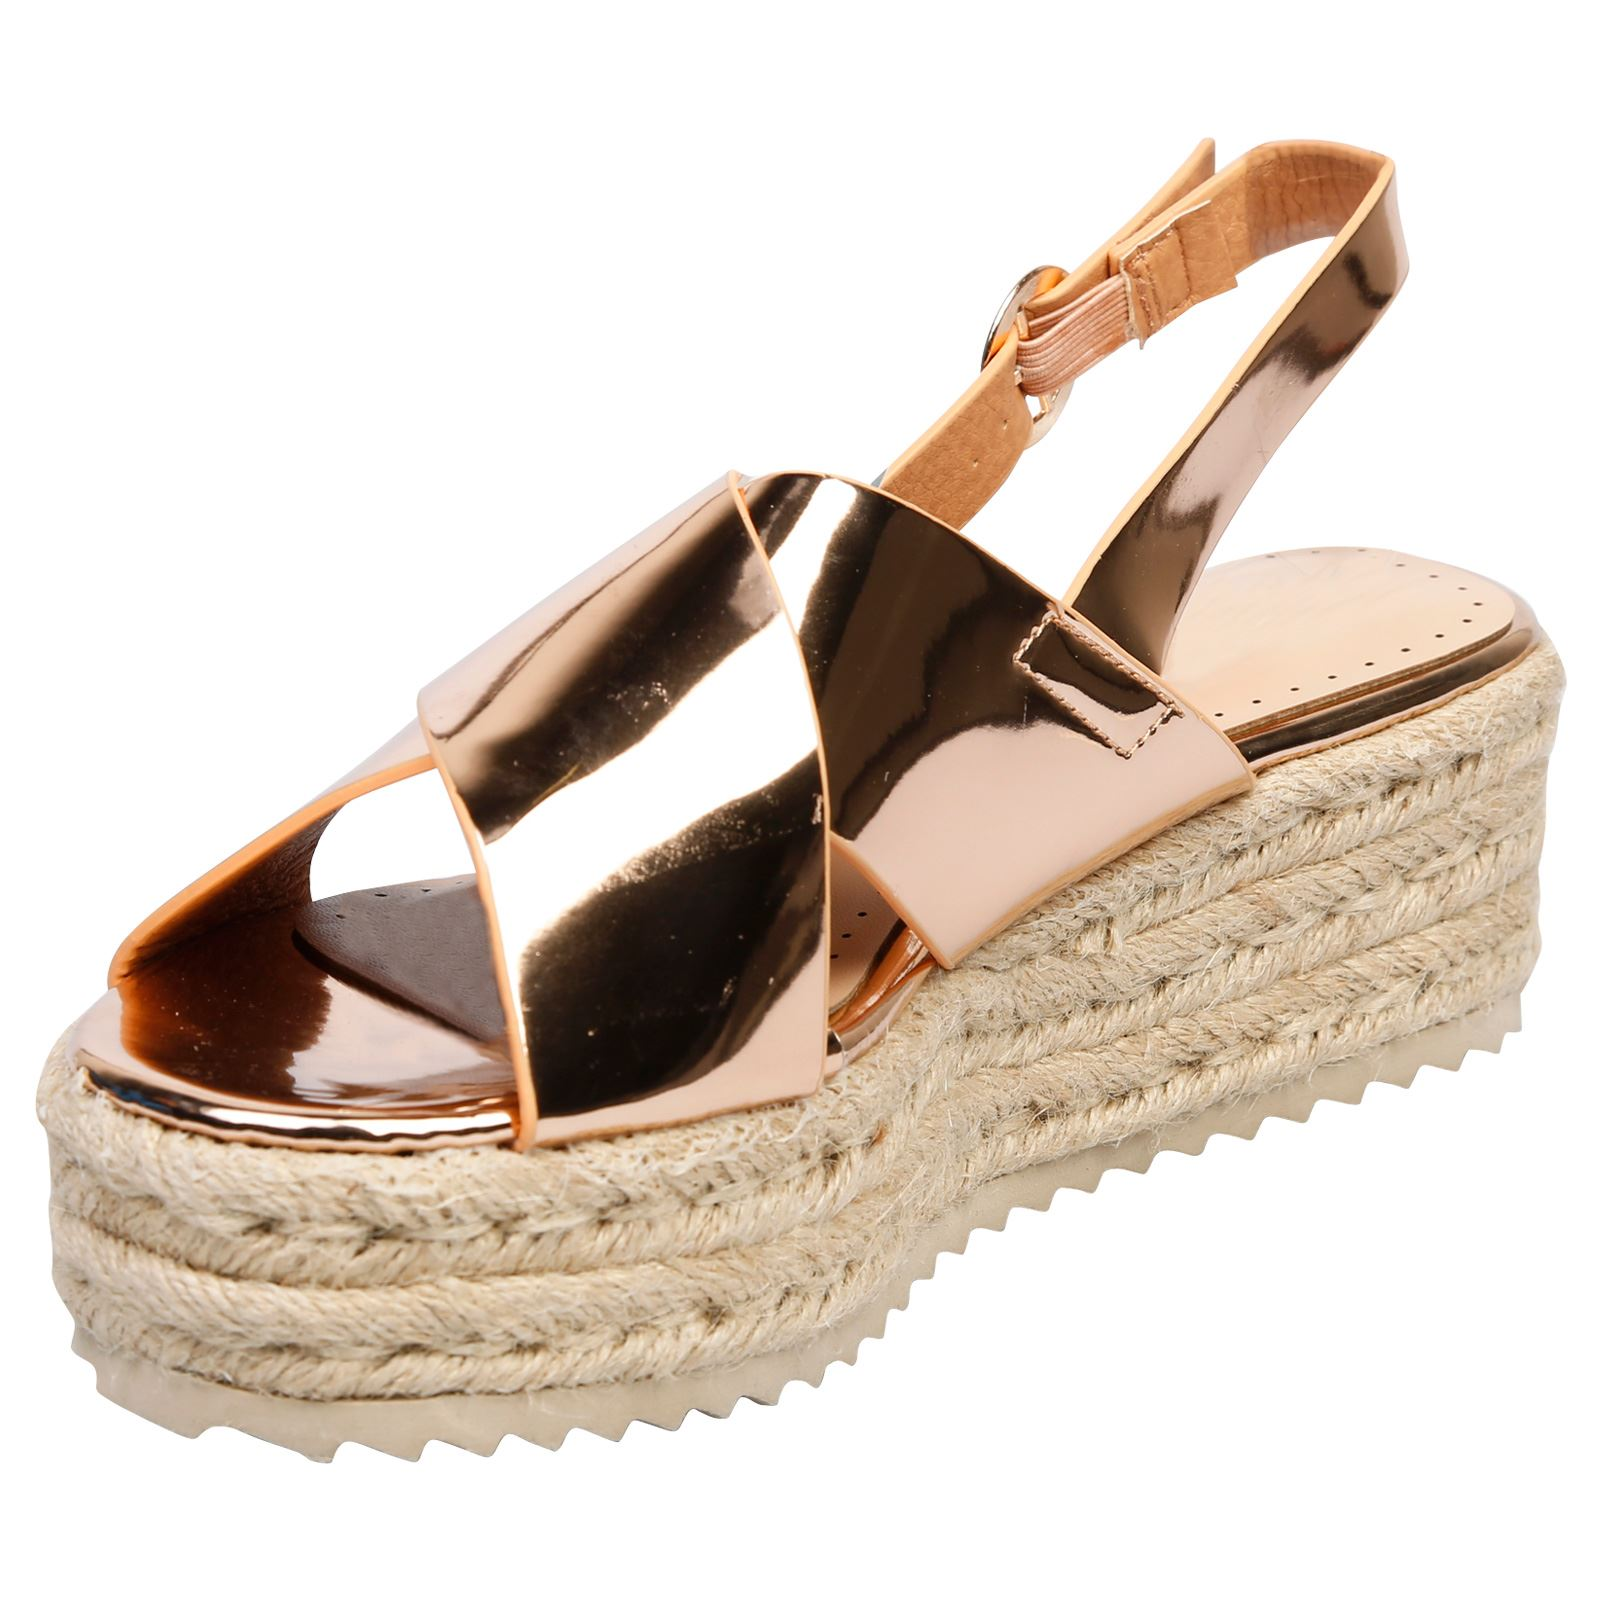 a2bc4effe96 Joanne Womens Flats Low Wedges Heels Platform Flatform Sandals ...